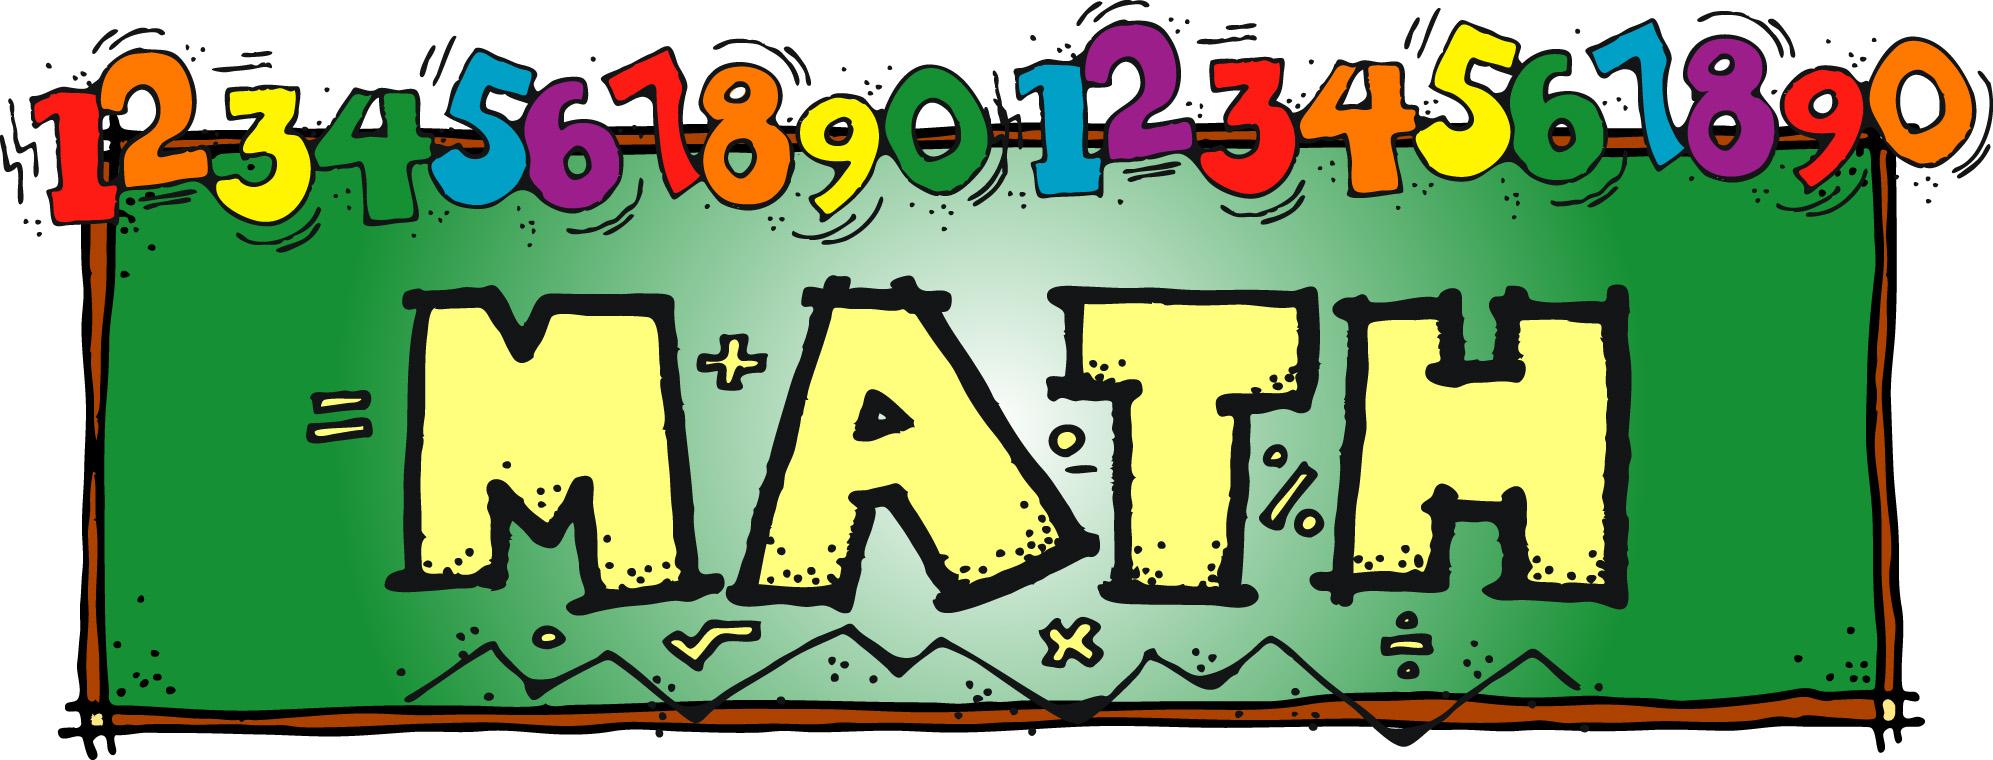 Number clipart math problem Math art Cliparting kid clipart